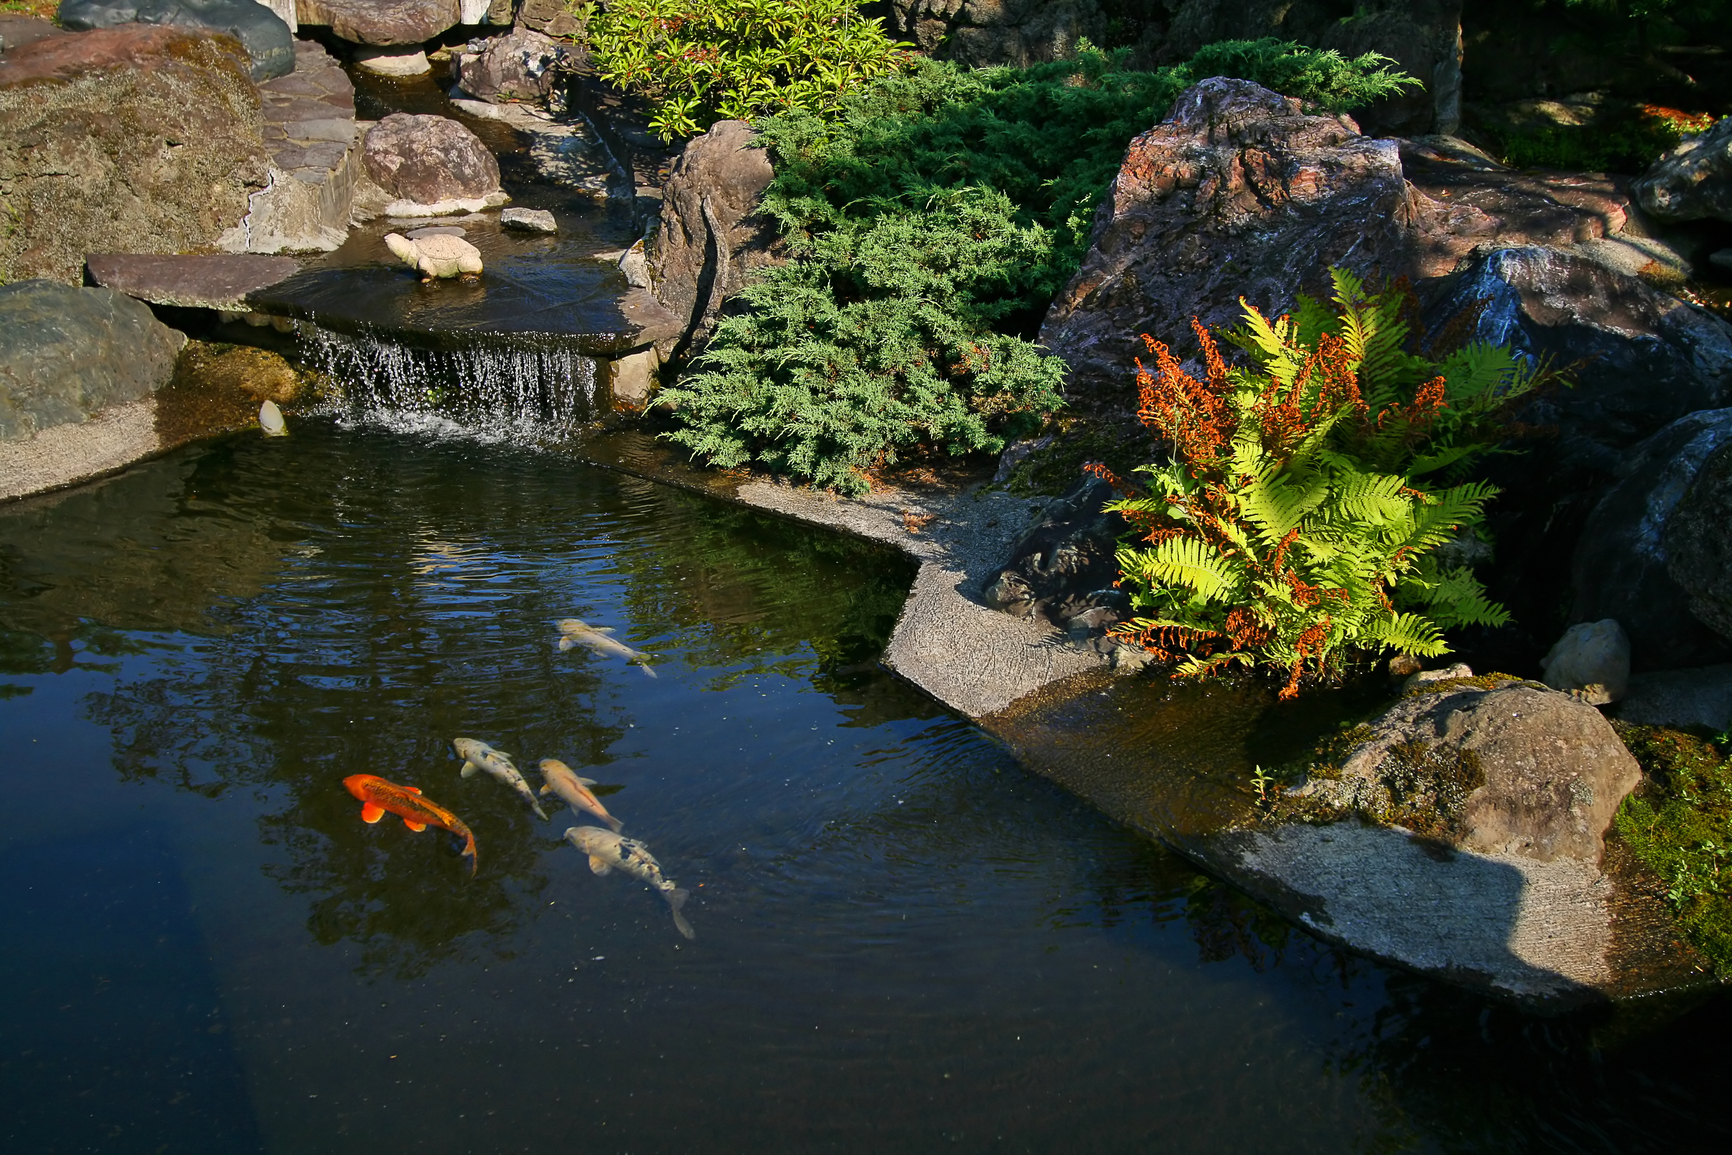 Jardin du monde #3 le jardin japonais | Blog Oleomac